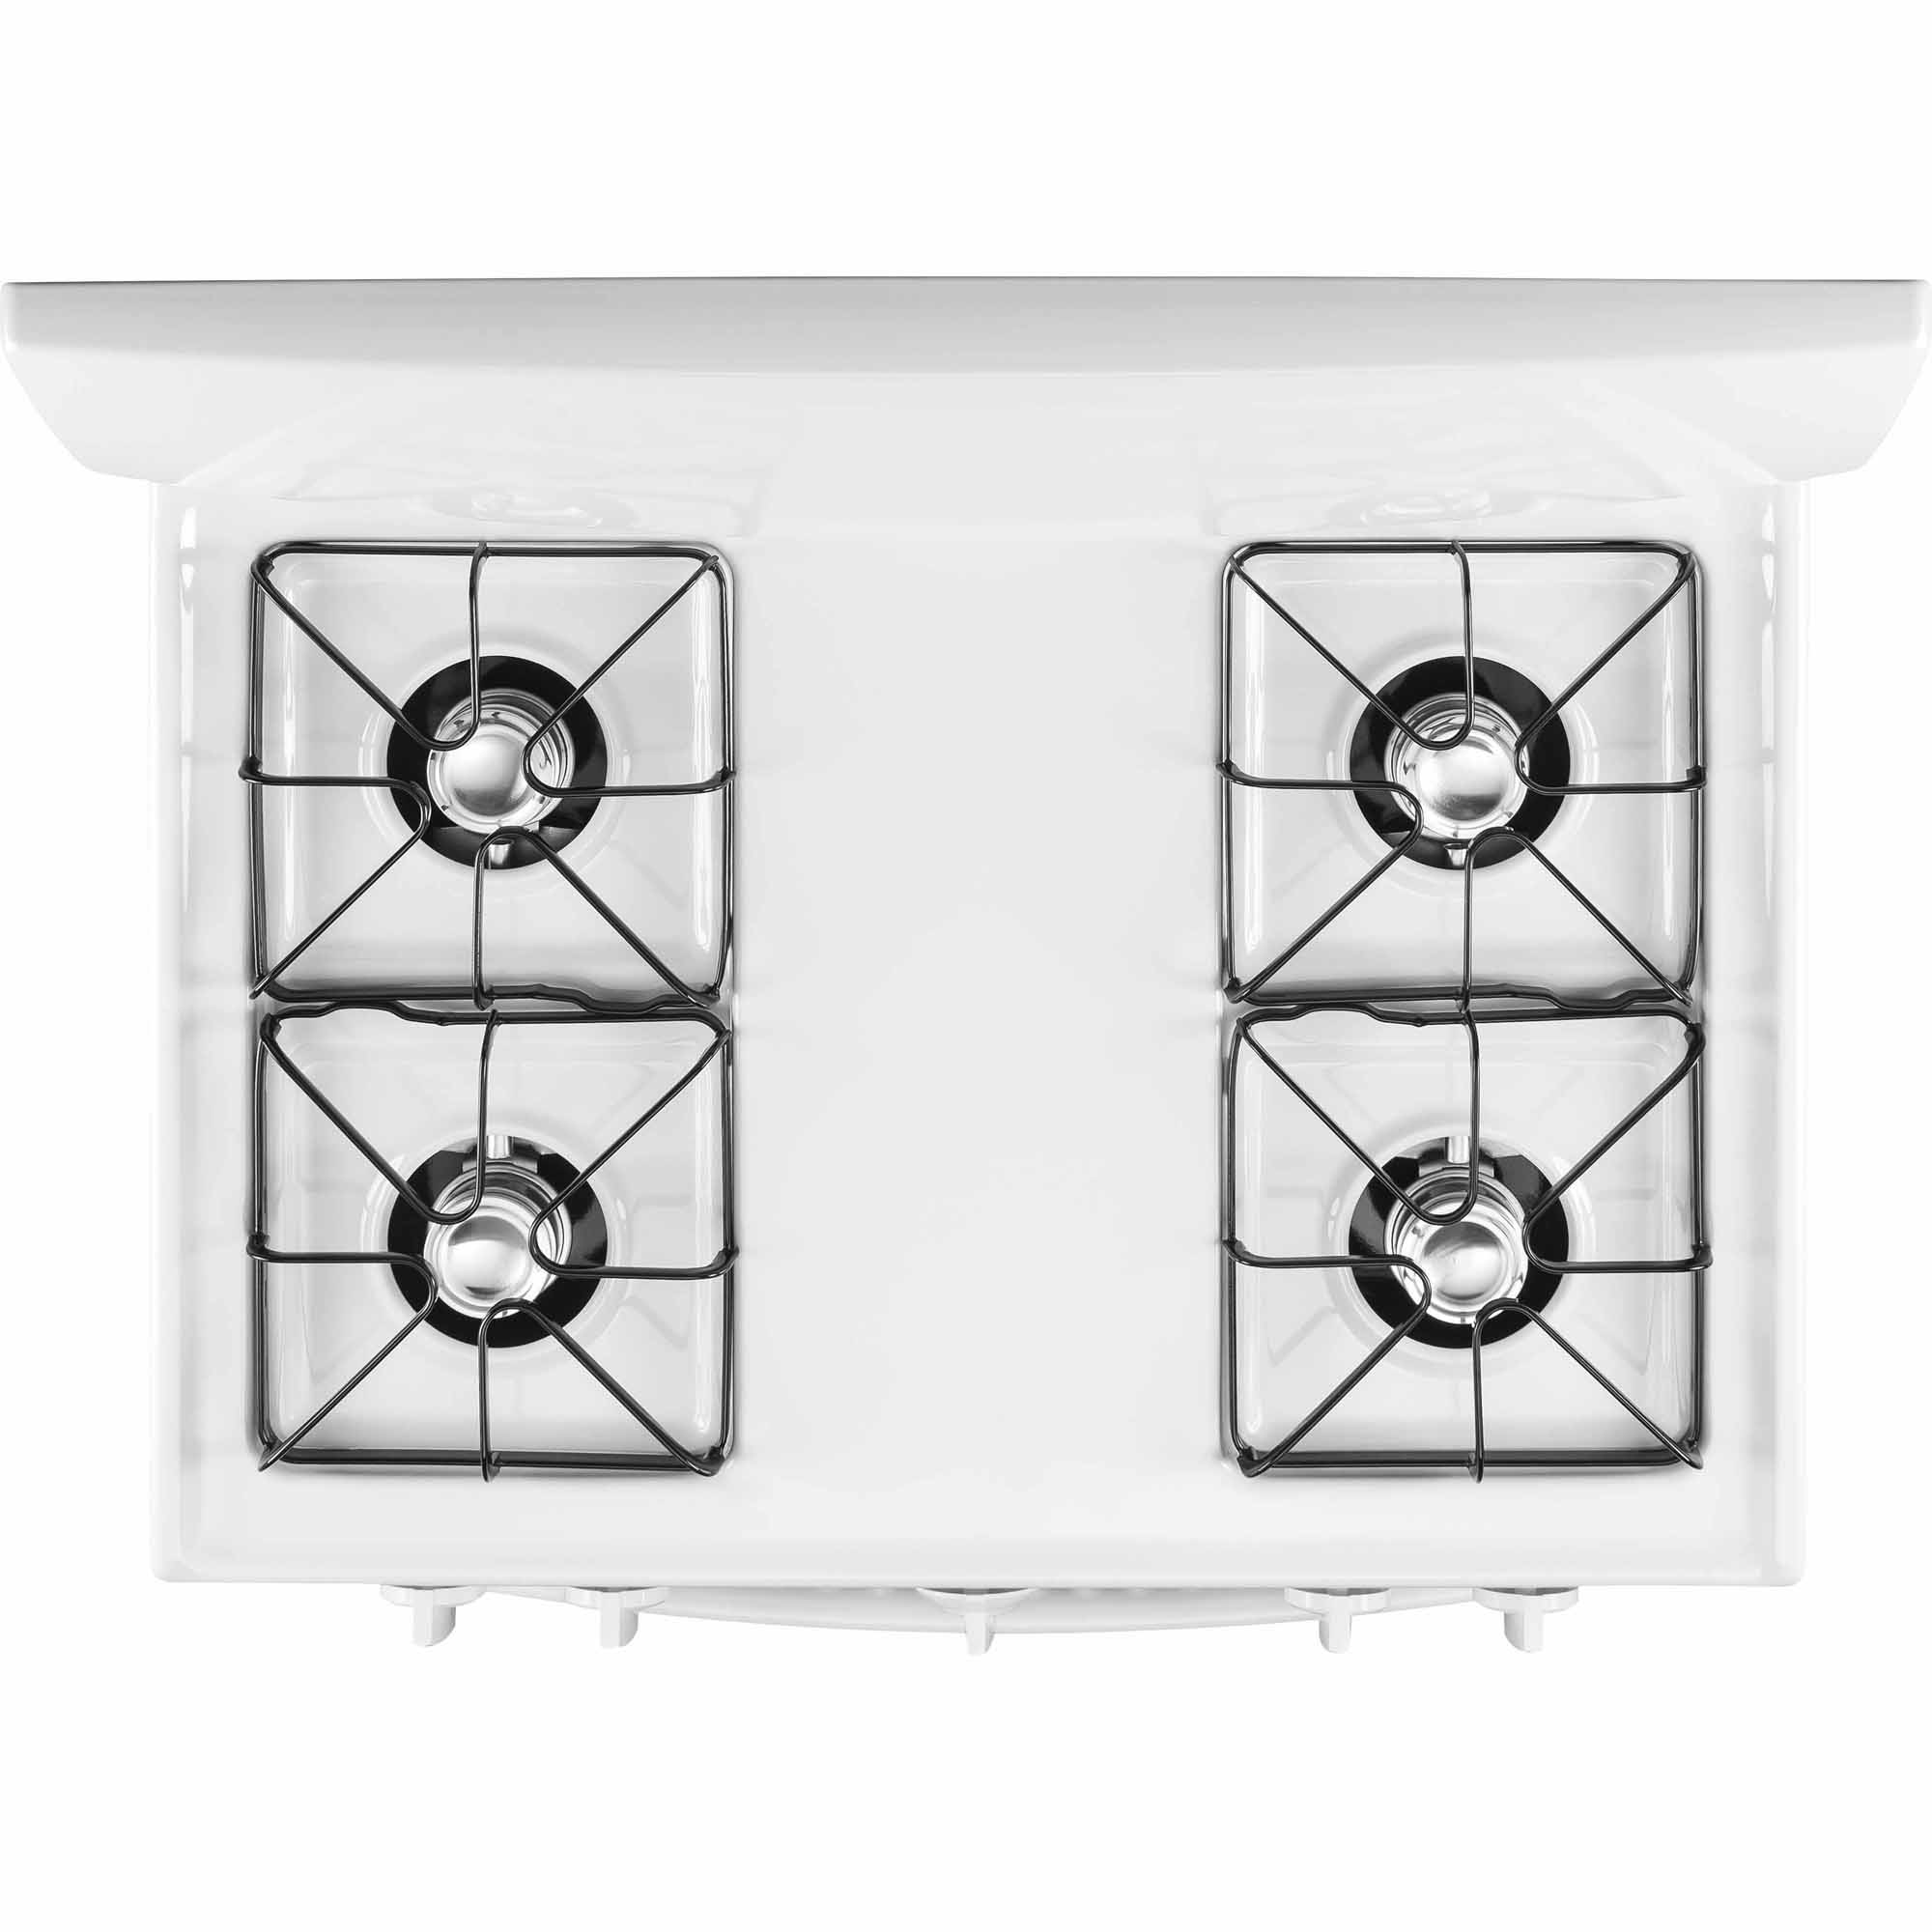 GE Appliances JGBS10DEFWW 4.8 cu. ft. Gas Range w/ LP Conversion Kit - White